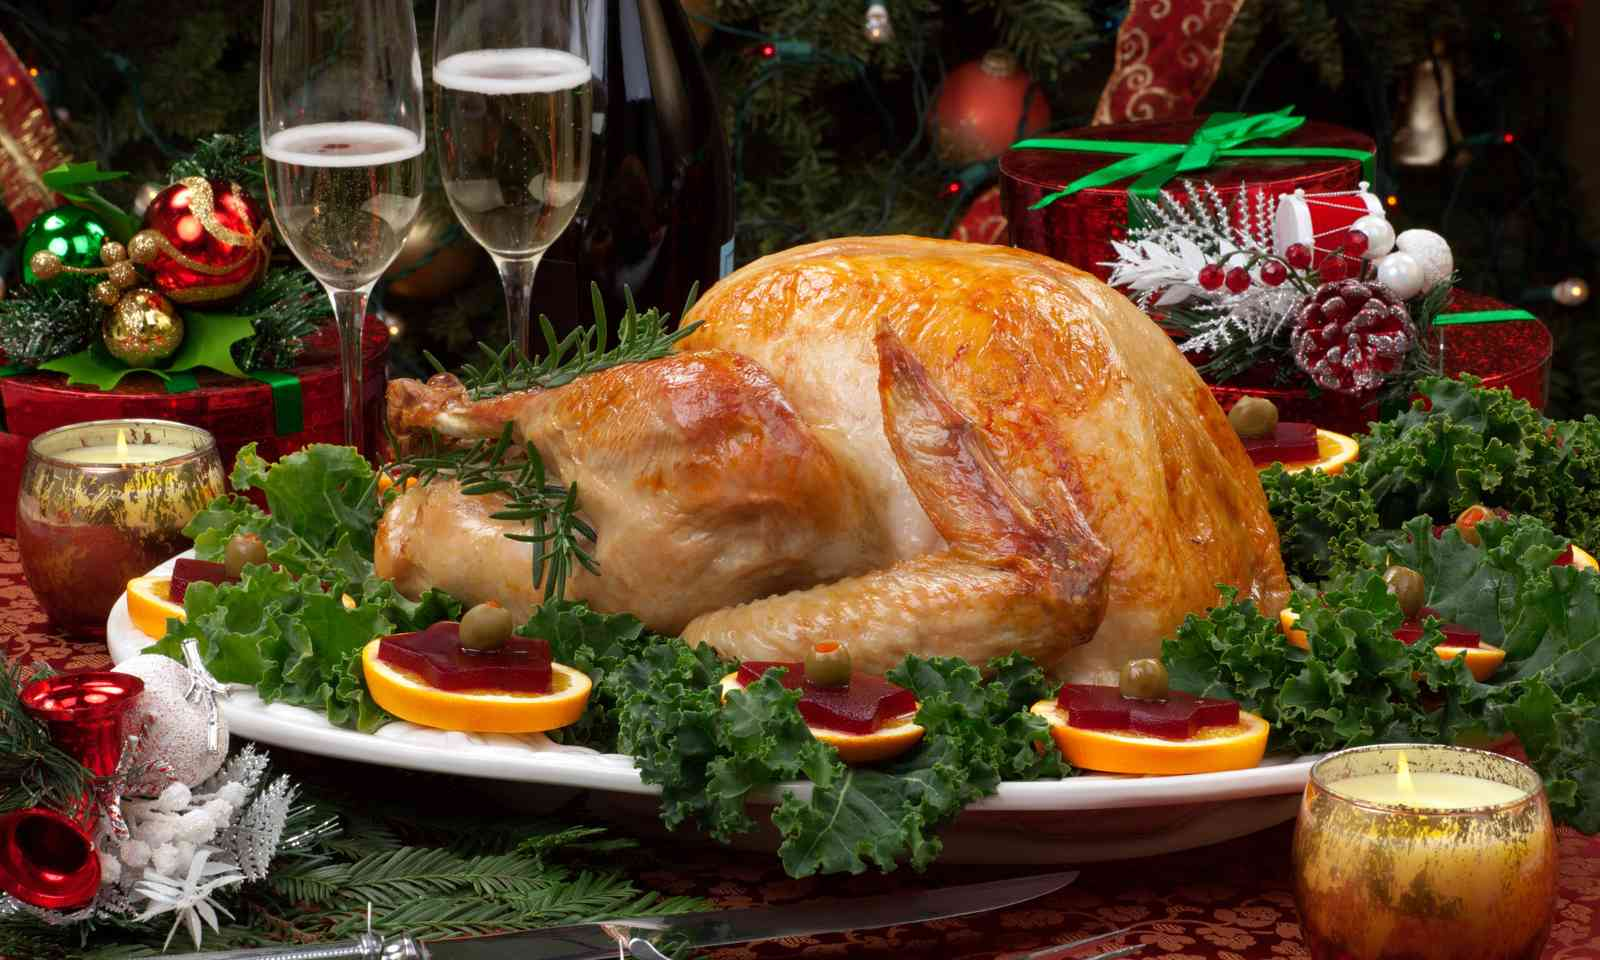 Christmas Turkey (Dreamstime)